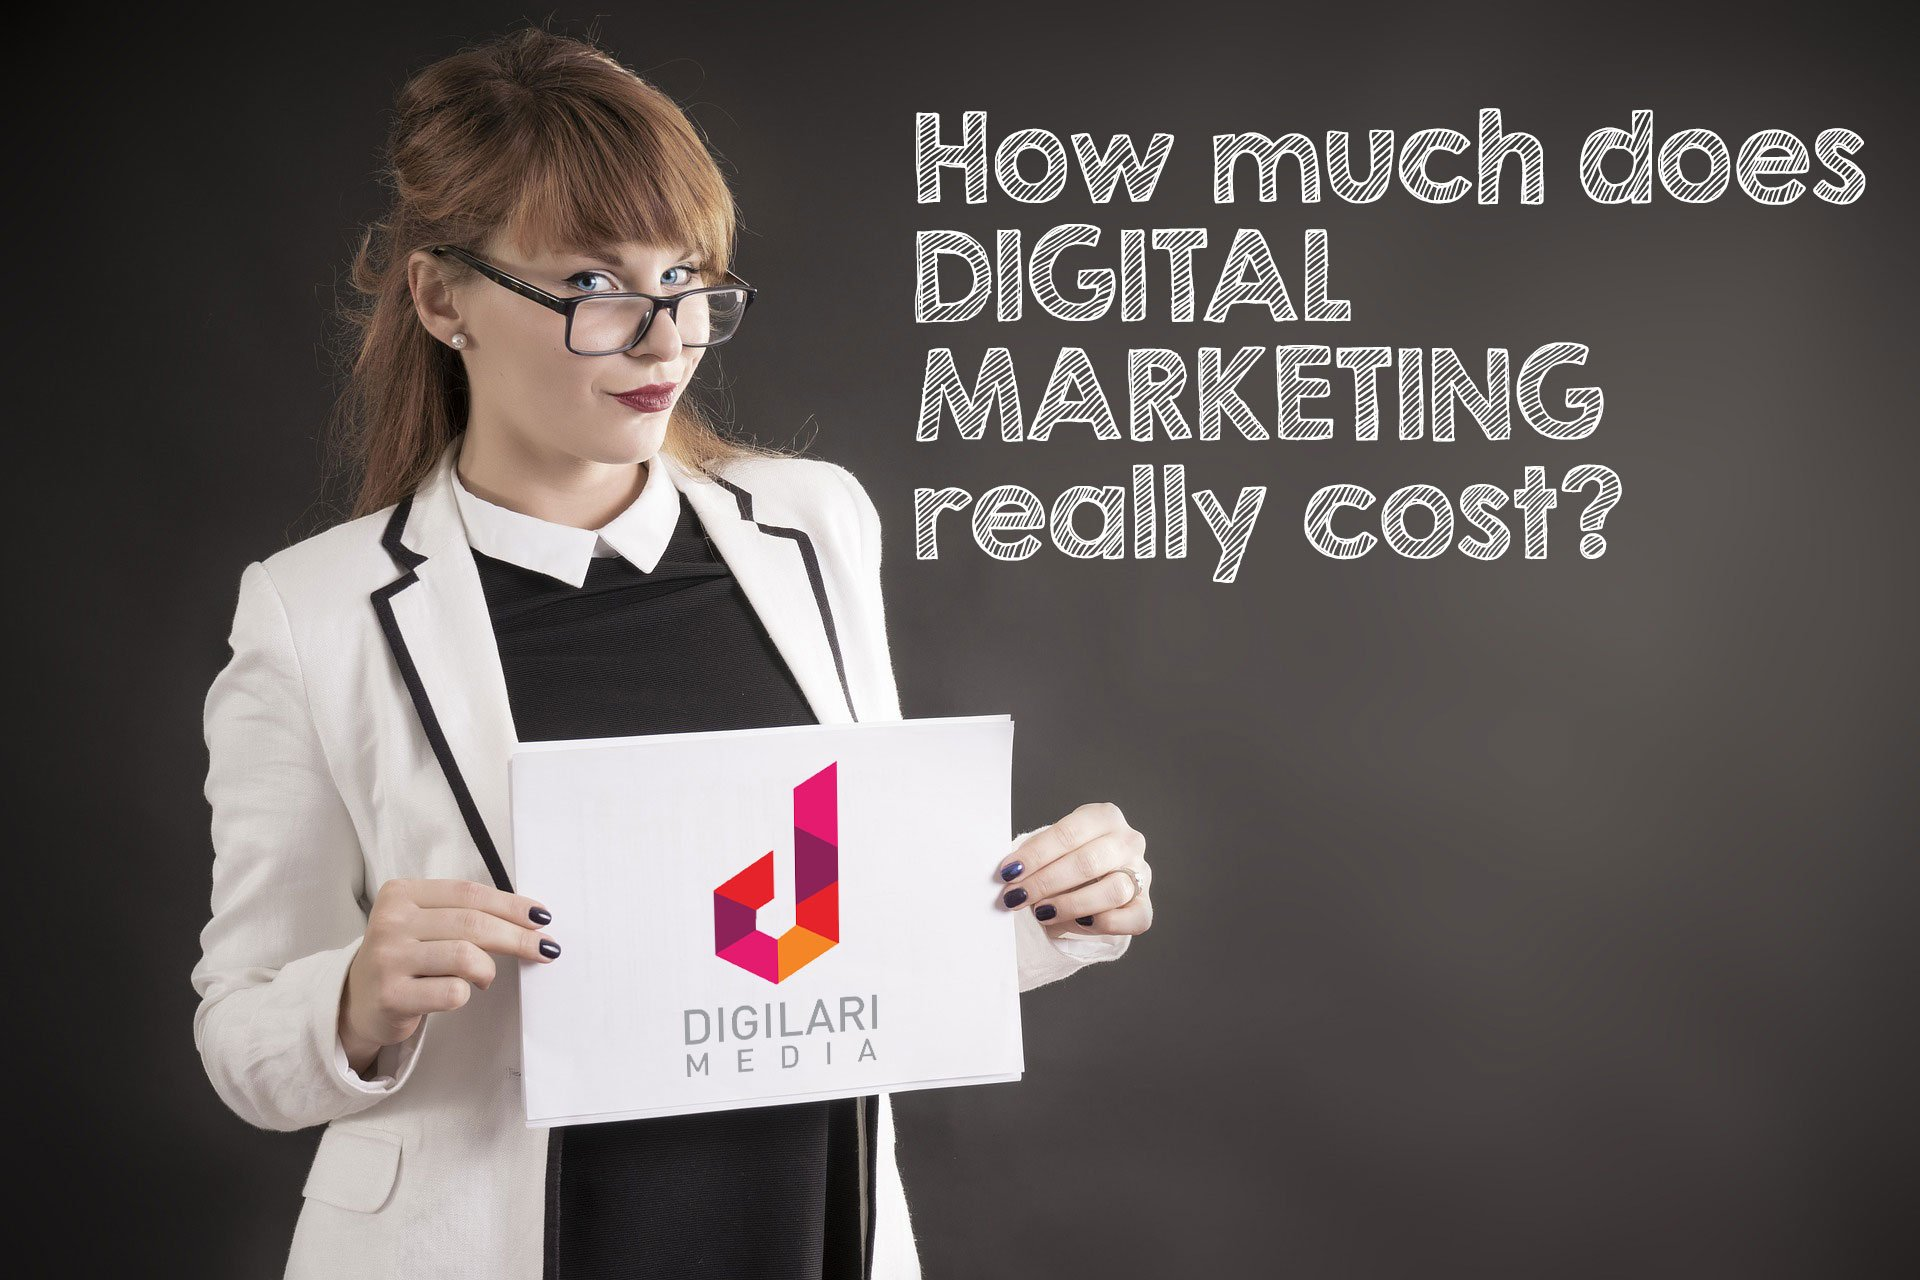 Digital Agency Costs